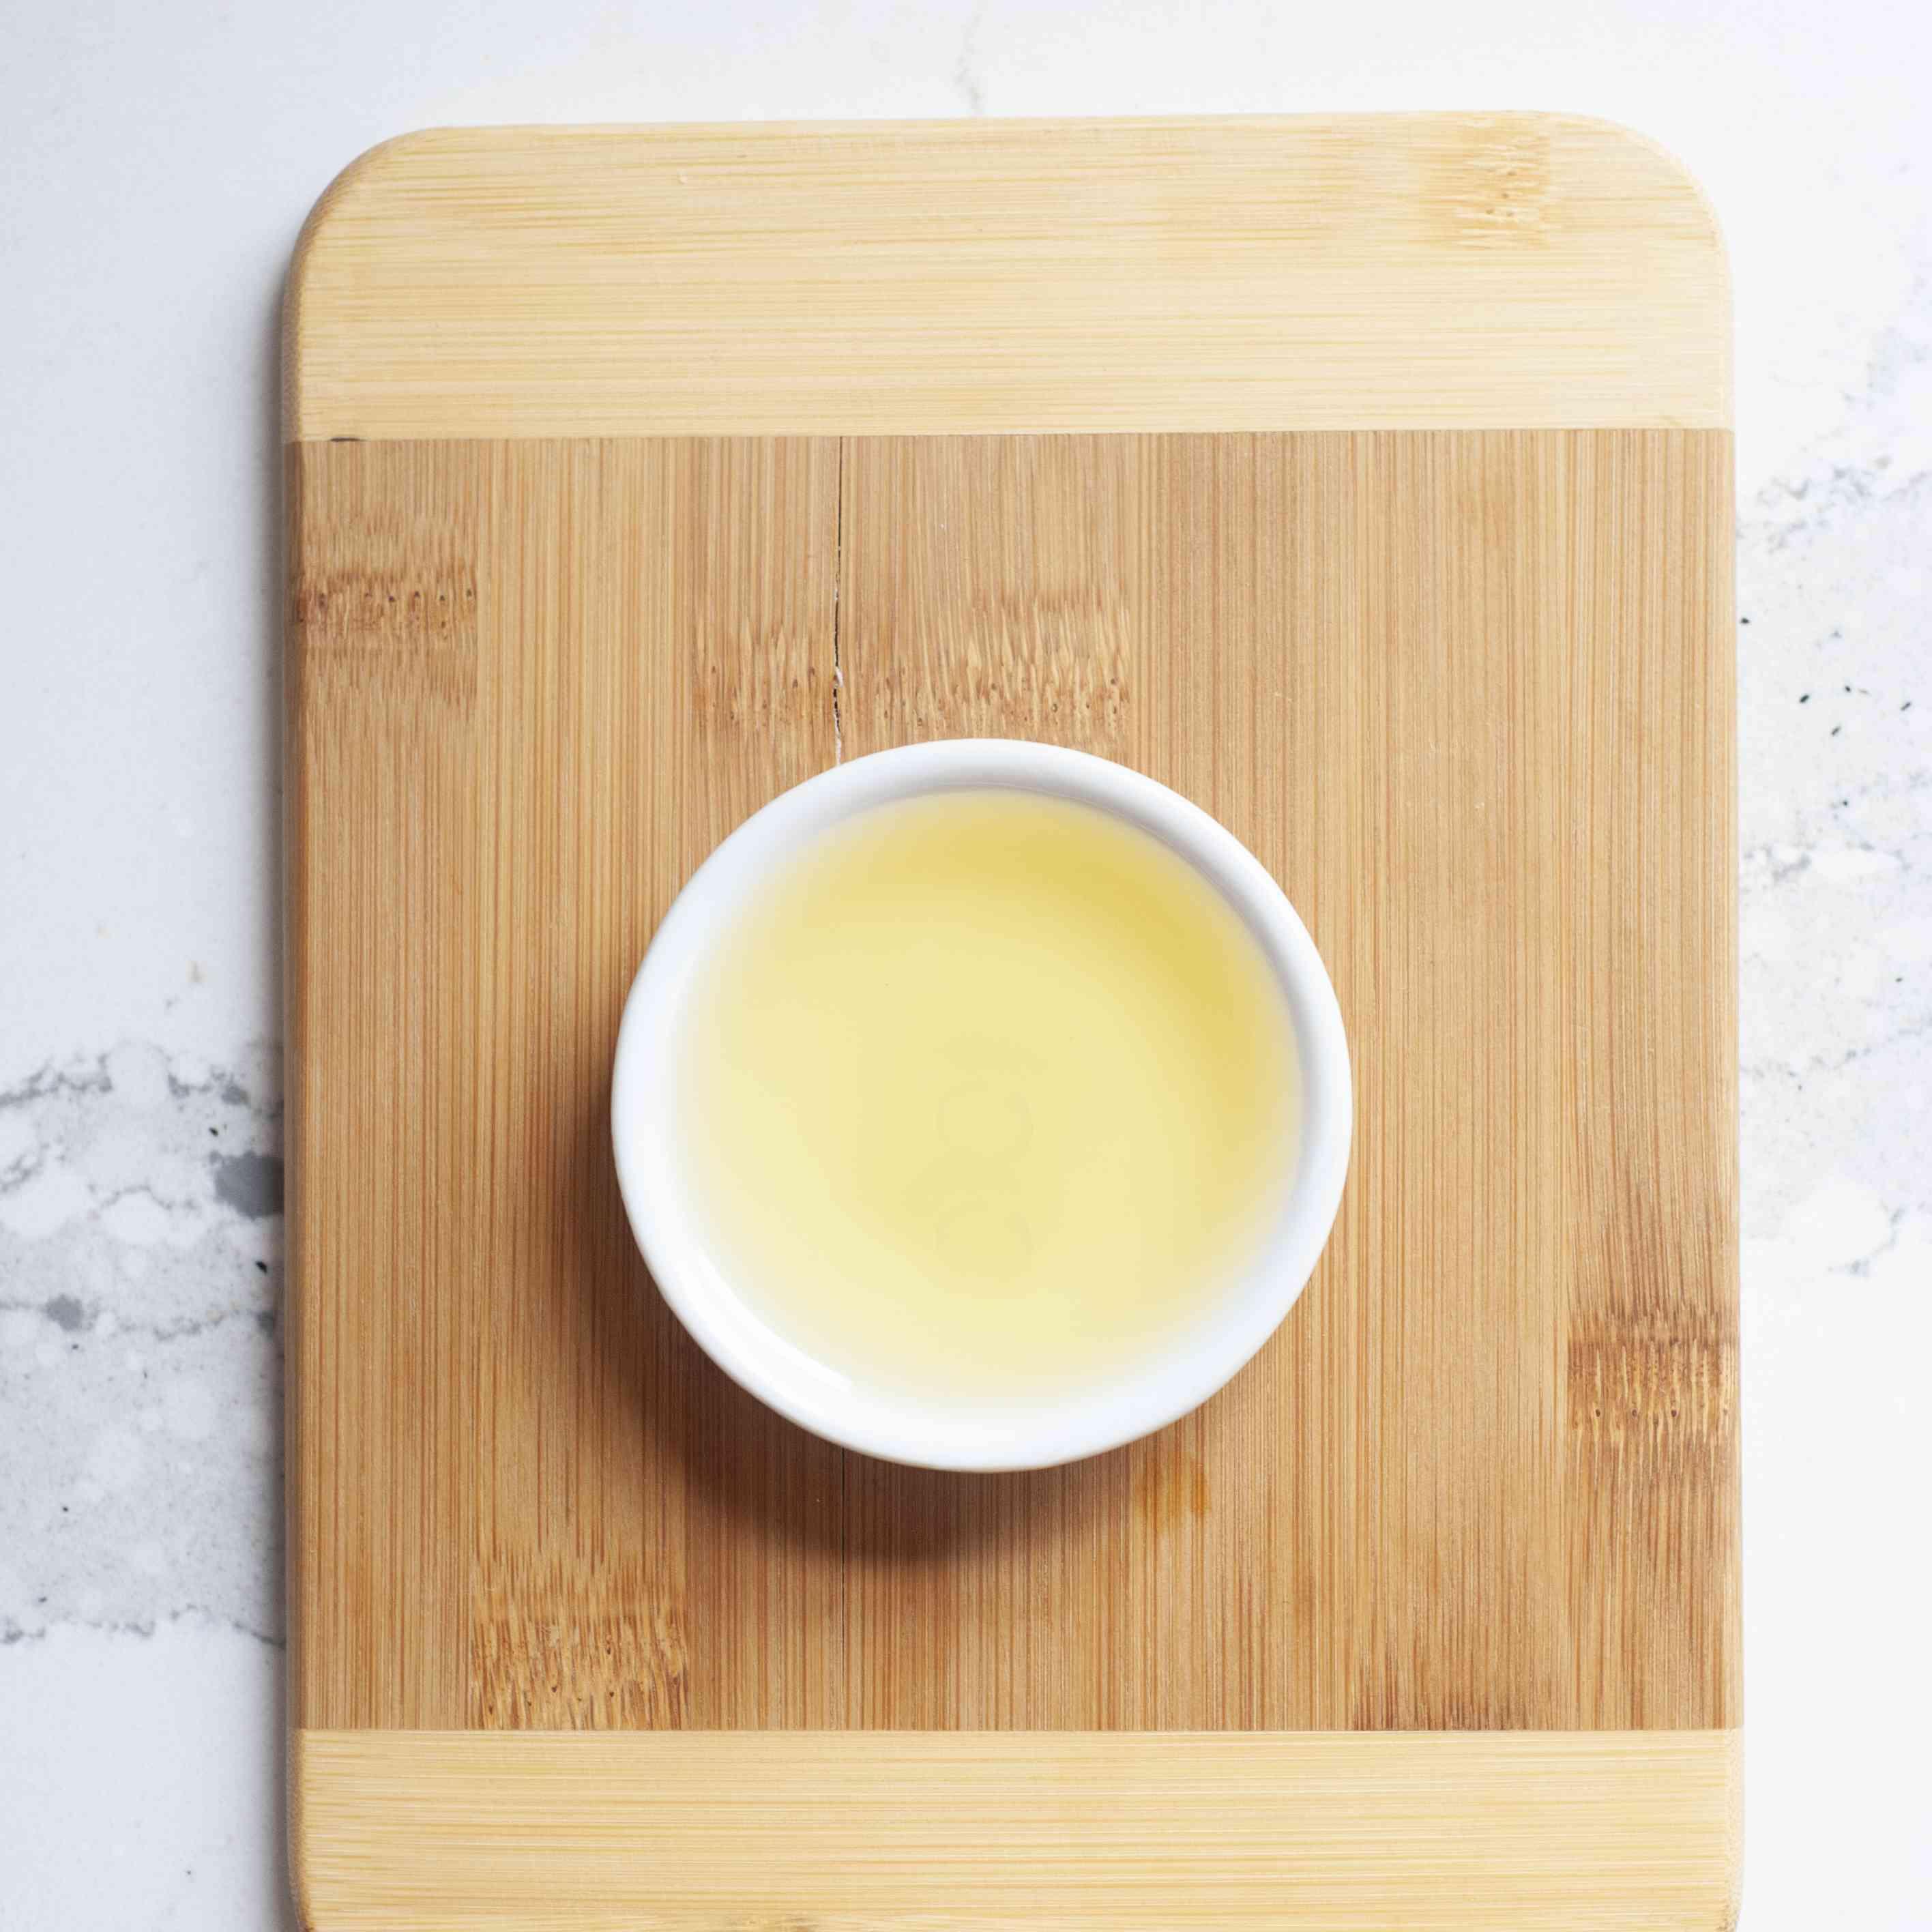 Light colored regular untoasted sesame oil in white bowl